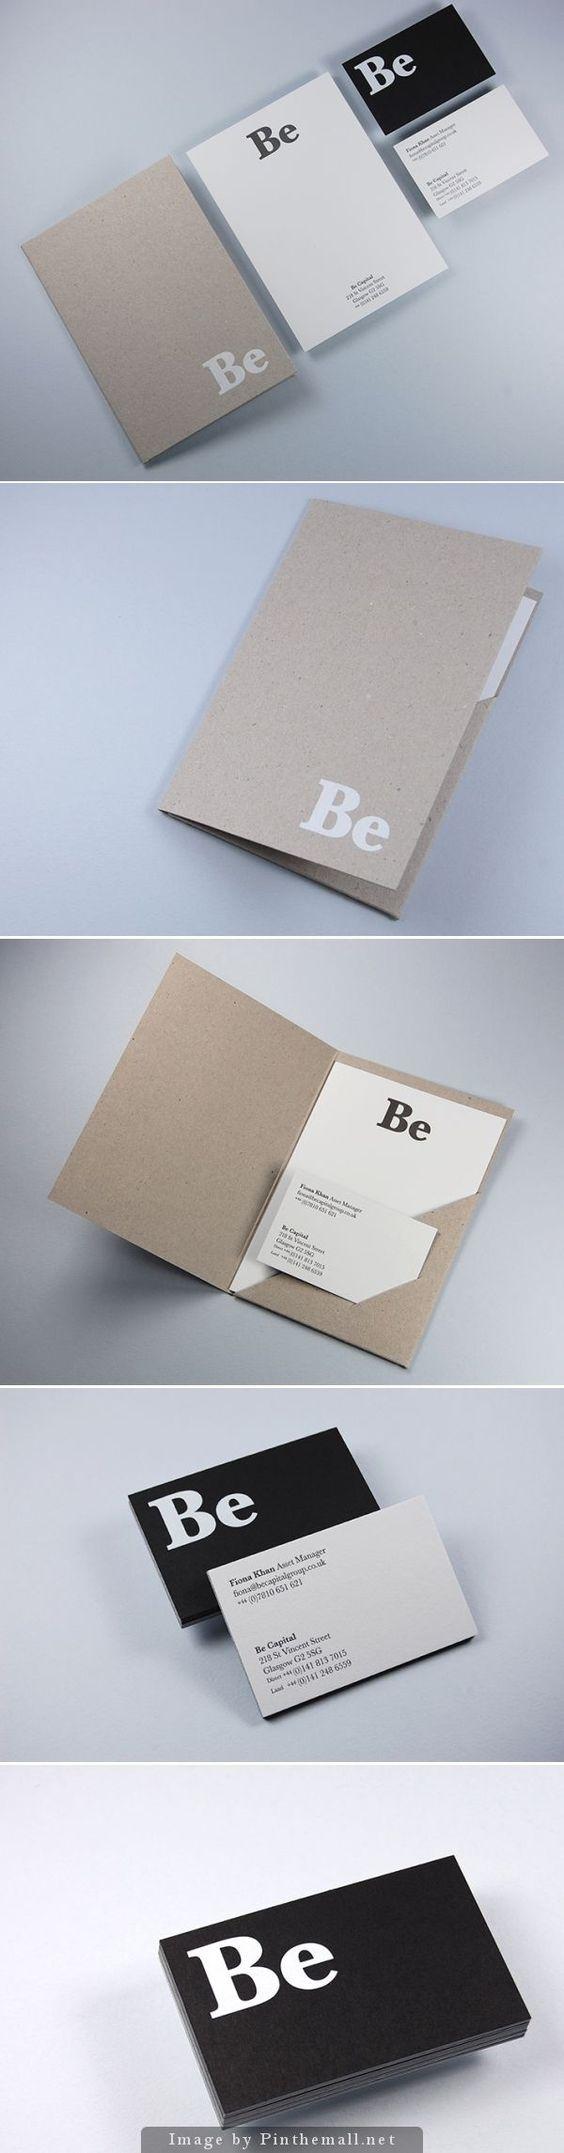 Corporate identity branding business card letterpress notebook minimal craft paper folder flyer graphic design: